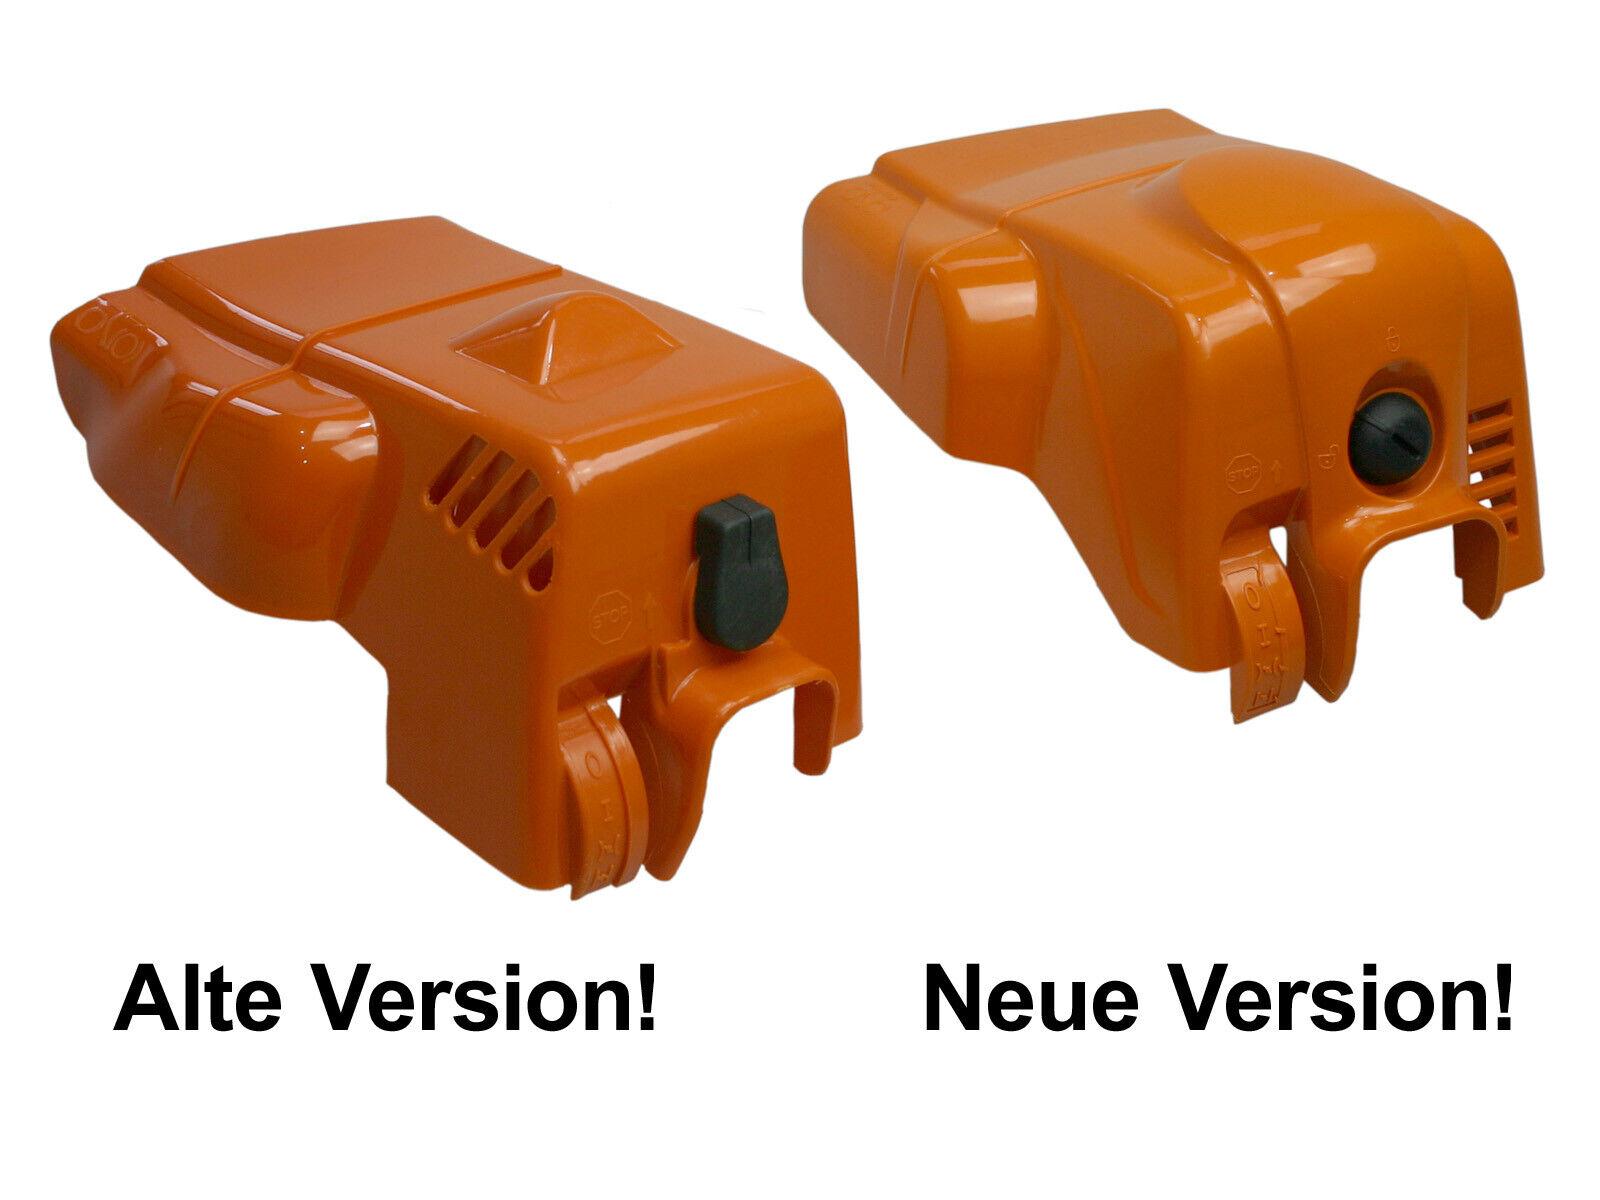 Vibrationsgummi passend für Stihl 017 MS170 MS 170 vibration dampener